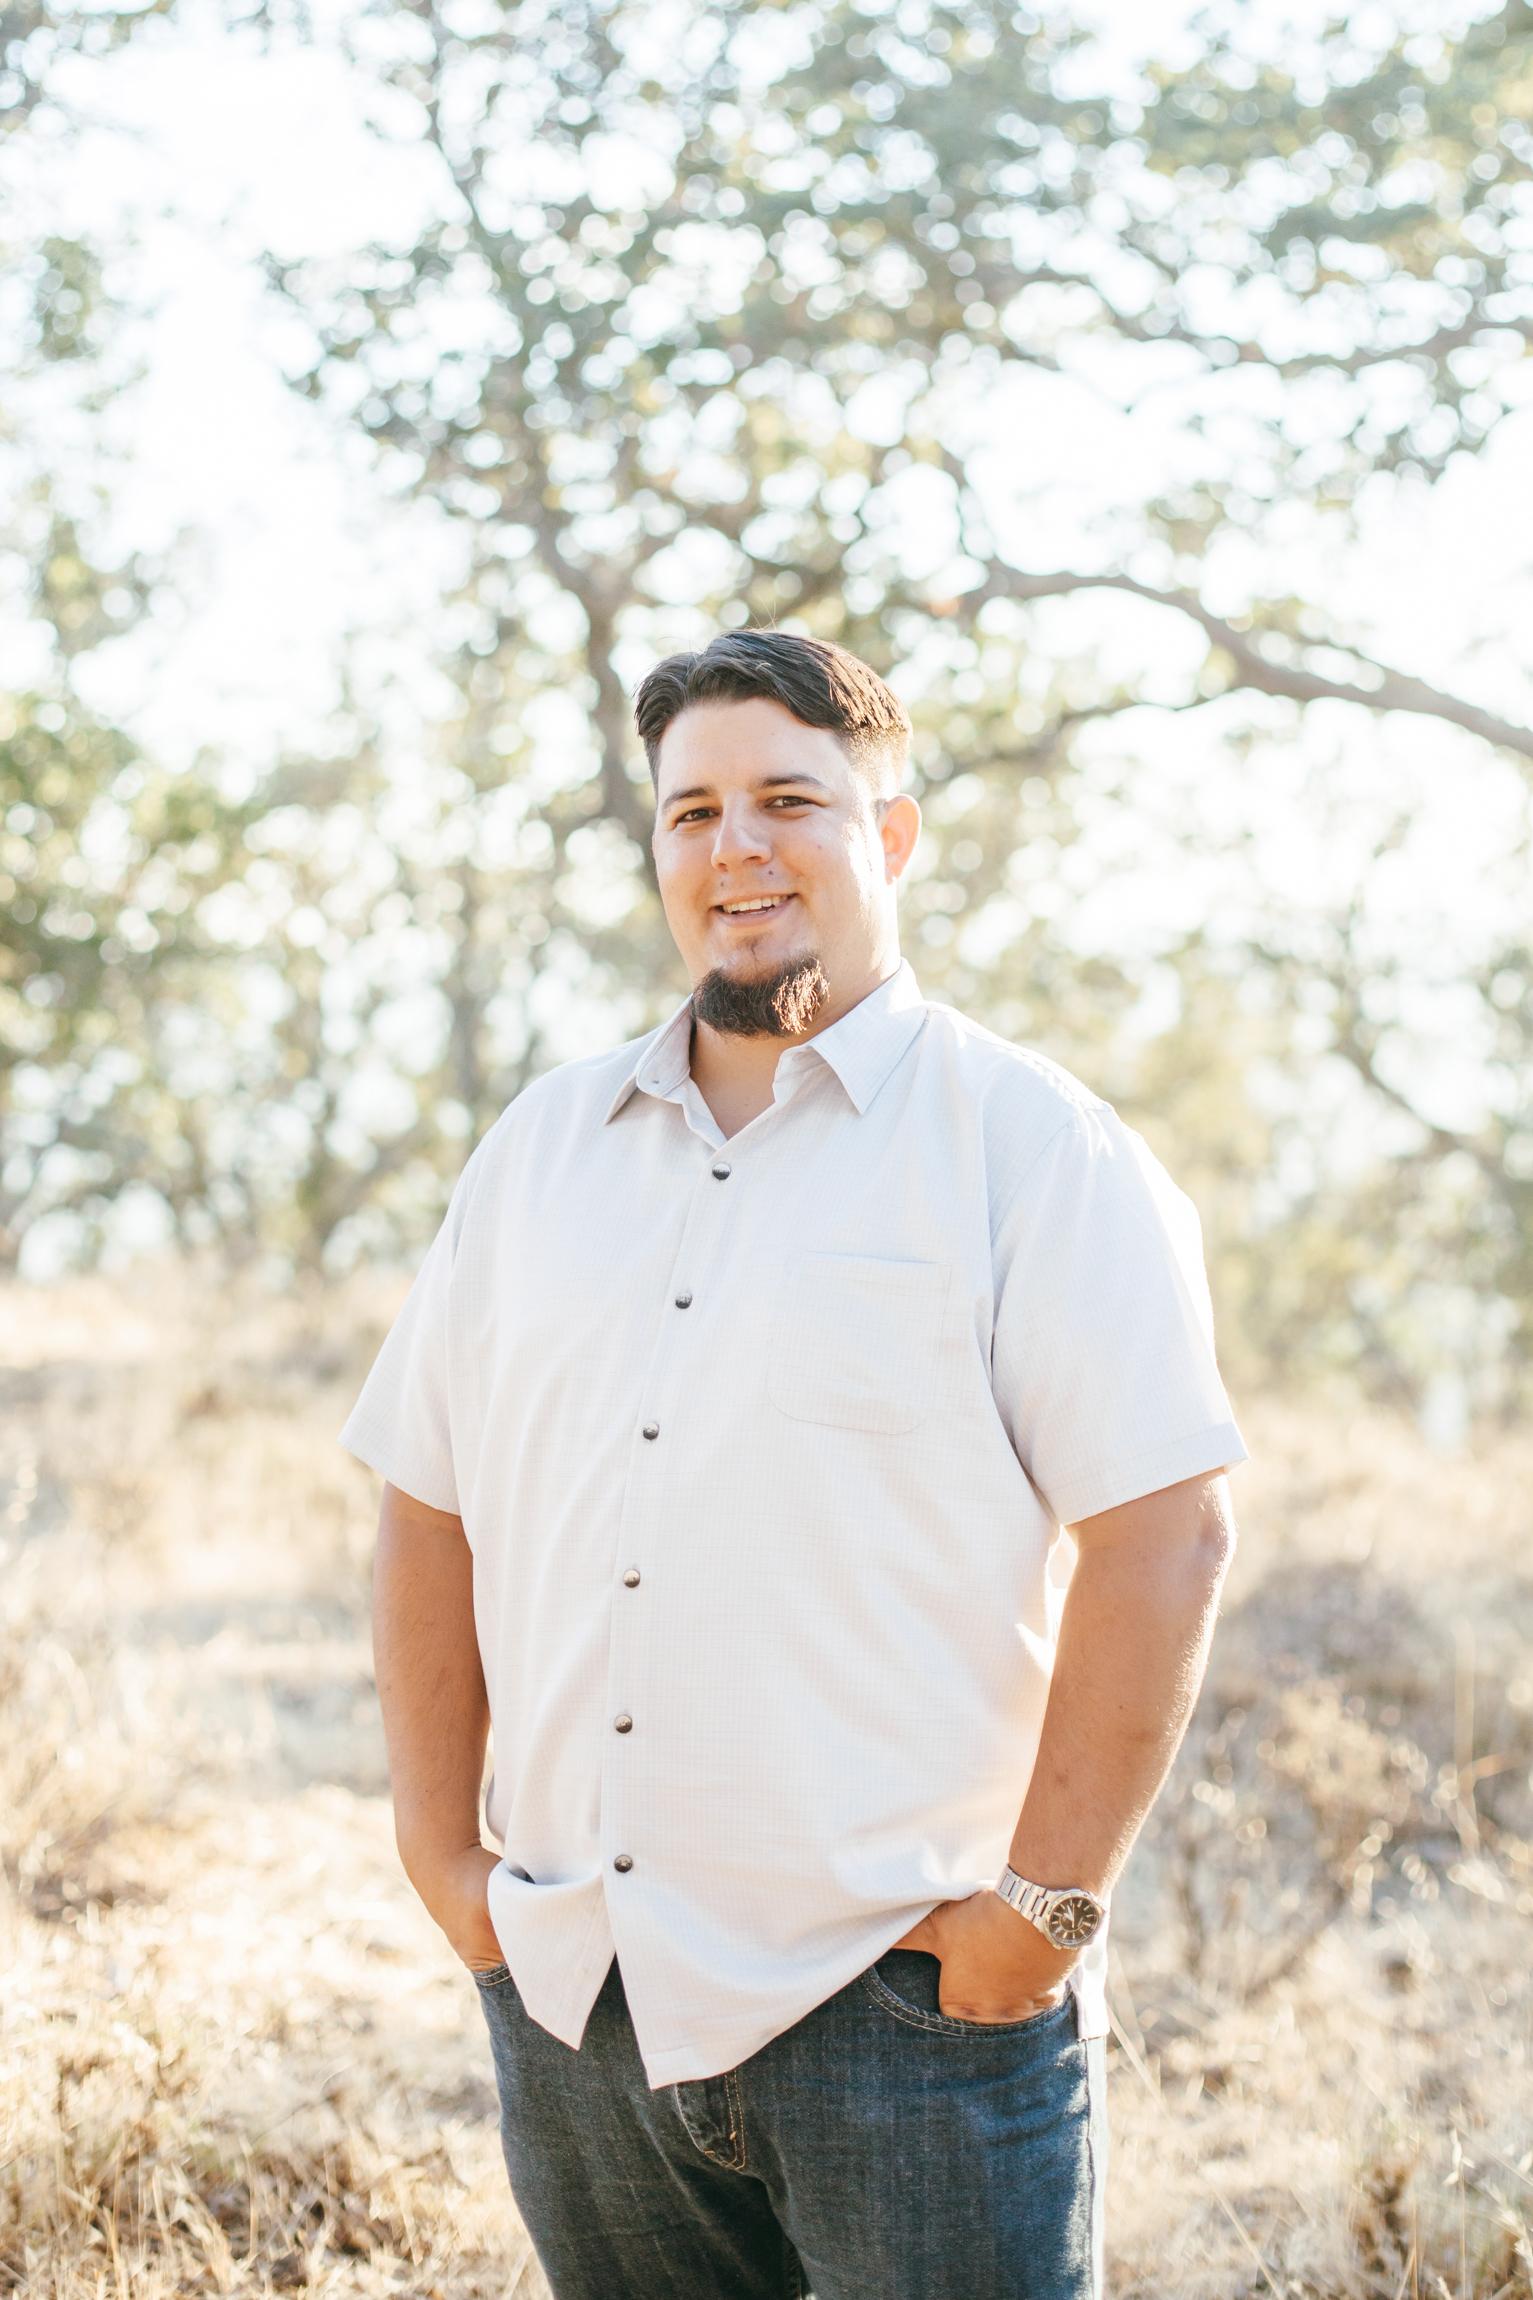 chris-diana-engagement-session-in-walnut-creek-california-08